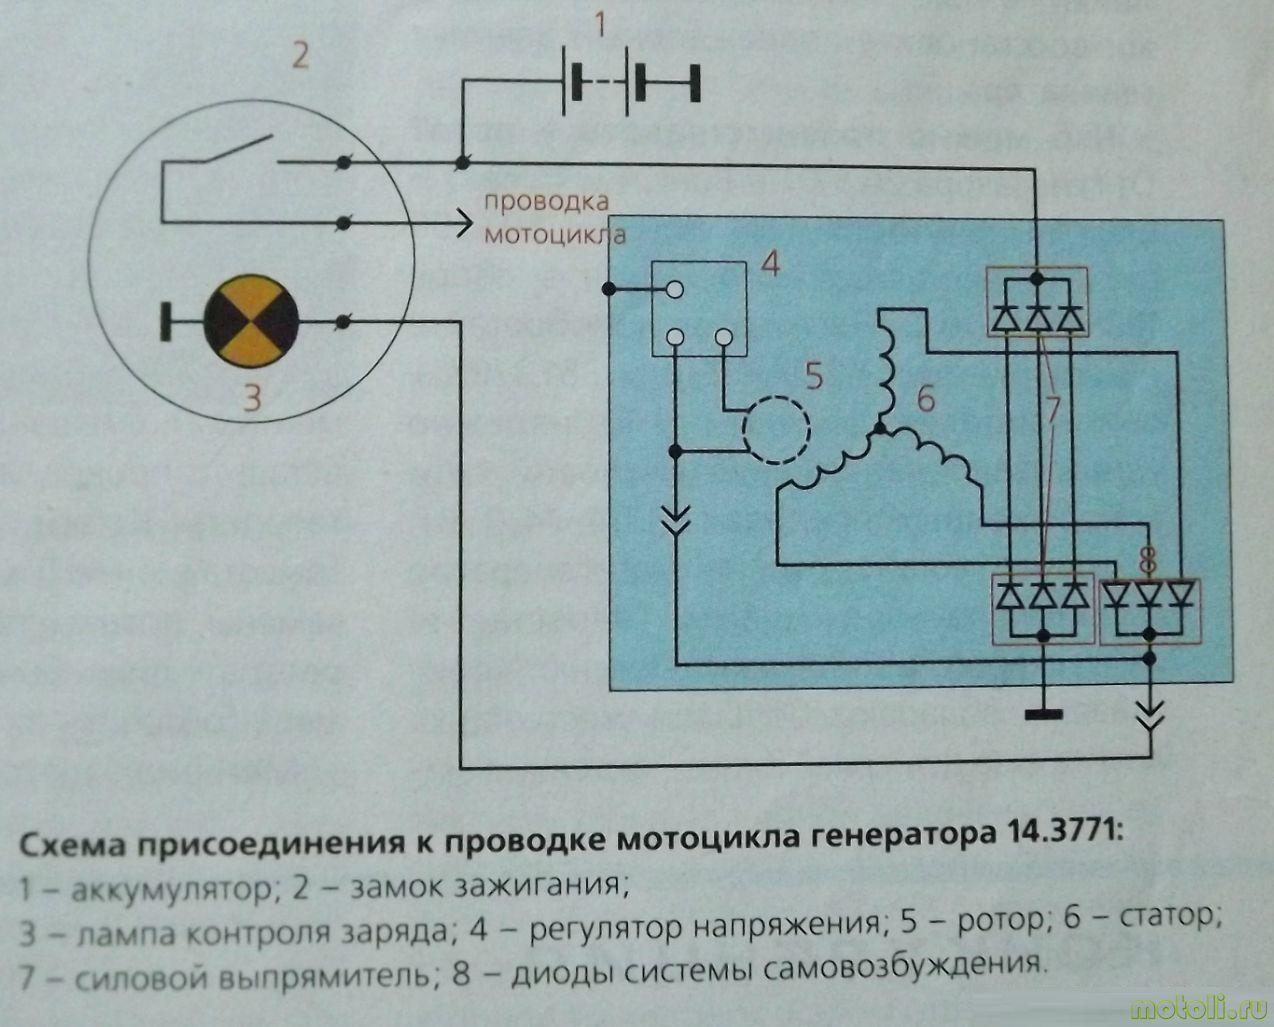 Схема 361.3702 регулятор напряжения